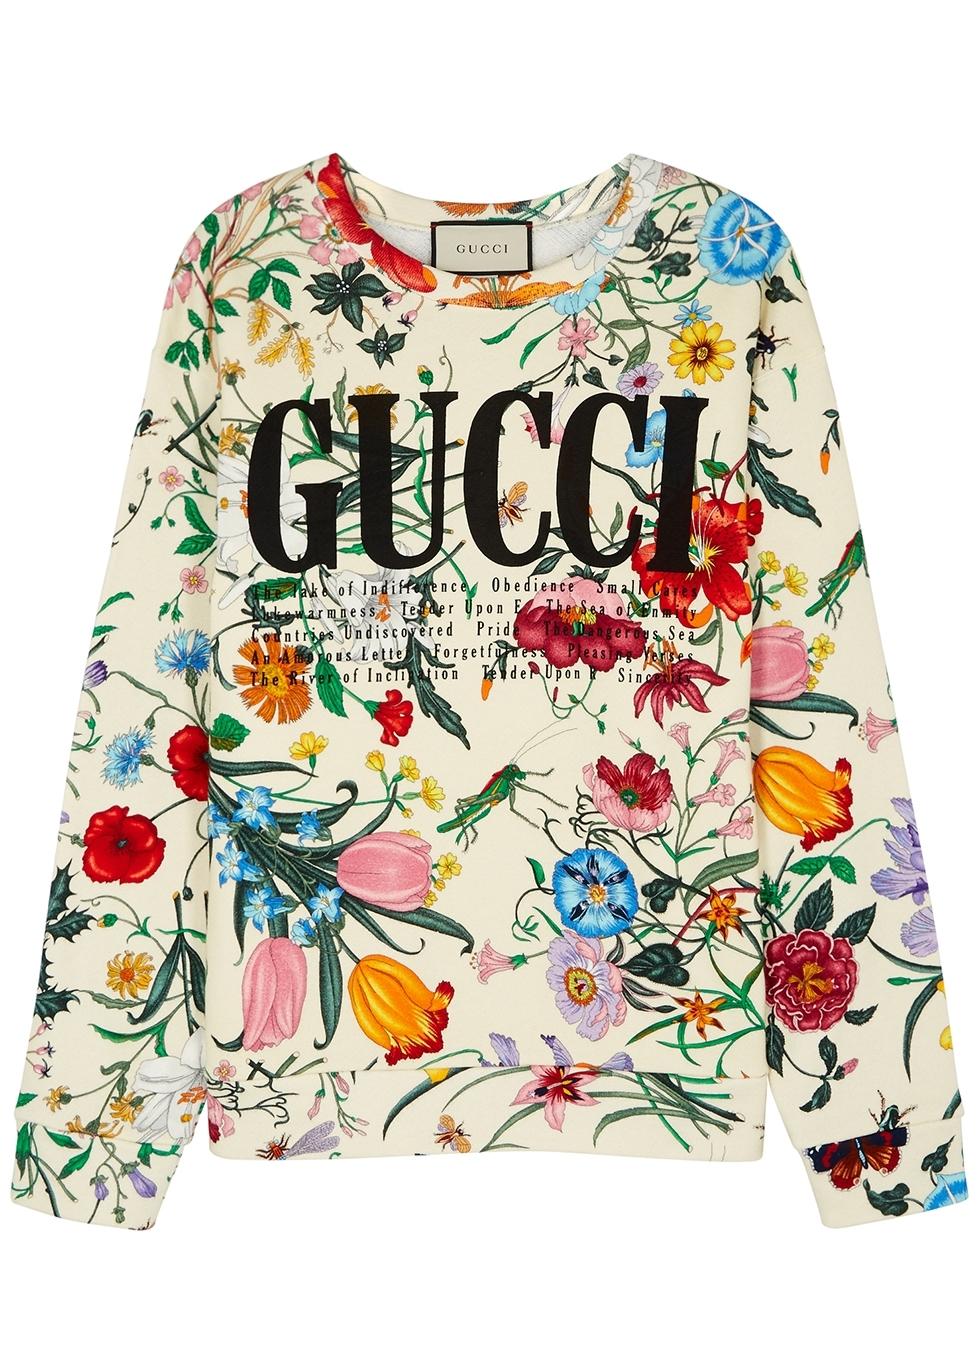 04a74999874 Gucci - Womens - Harvey Nichols